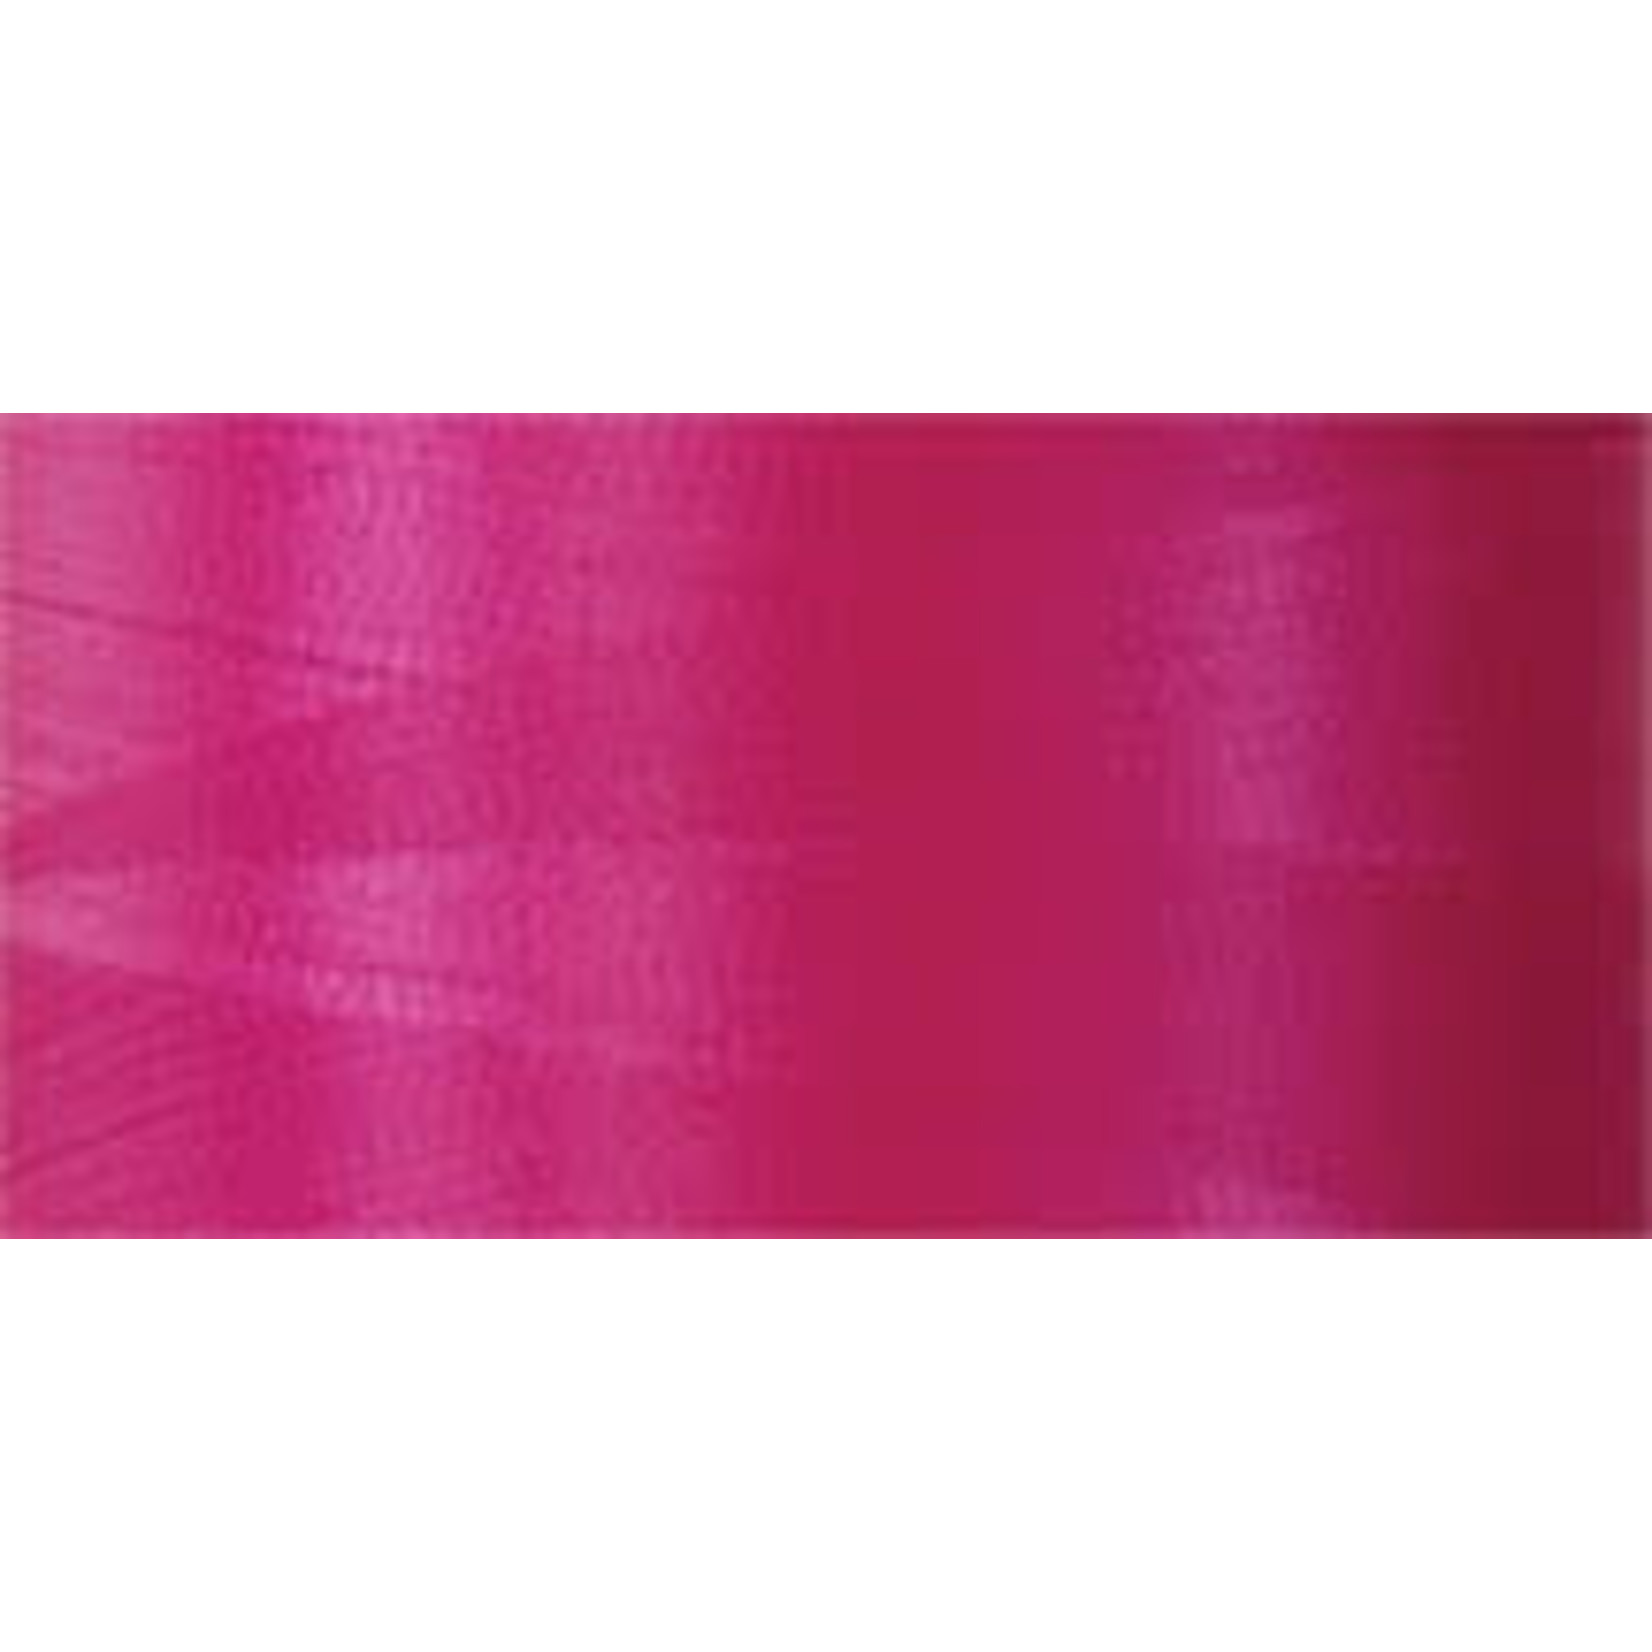 Superior Threads Bottom Line - #60 - 1300 m - 630 Magenta